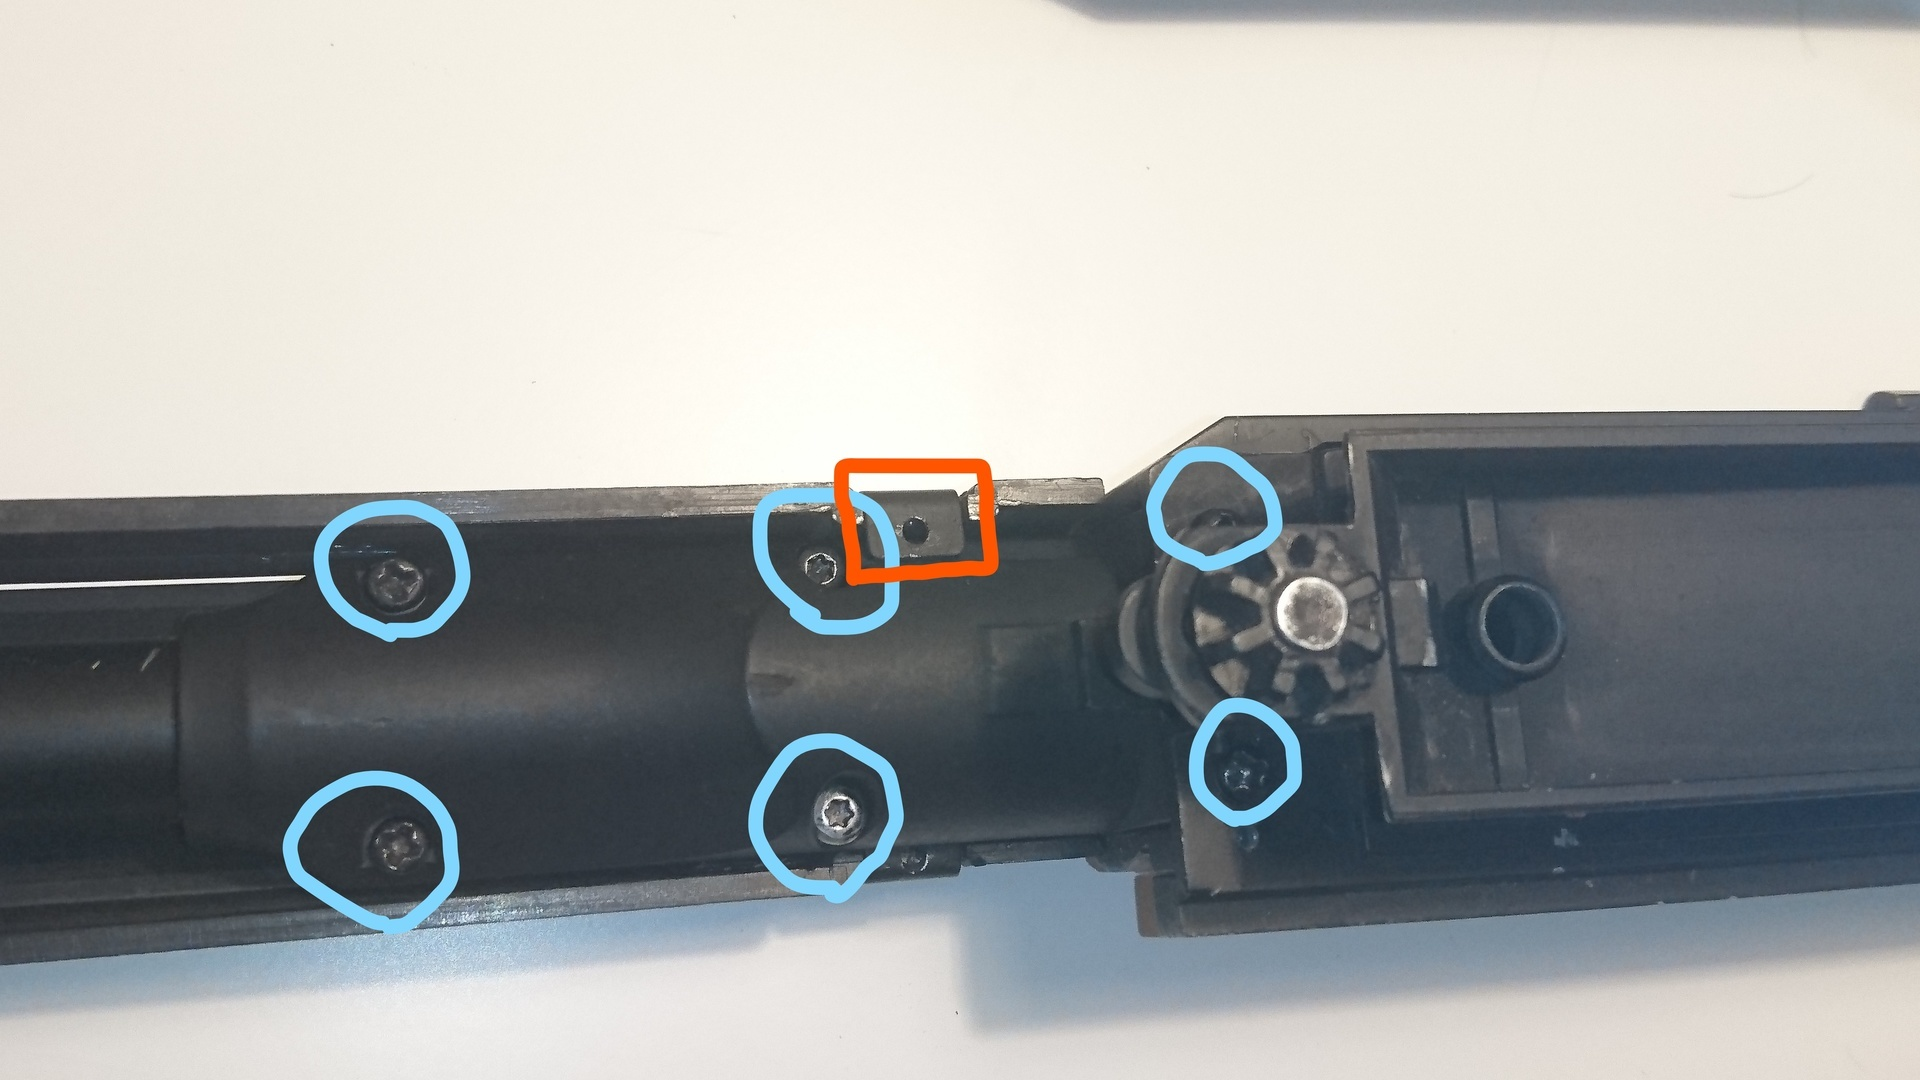 M14 socom 分解作業 パッキン交換 マズル分解 図解